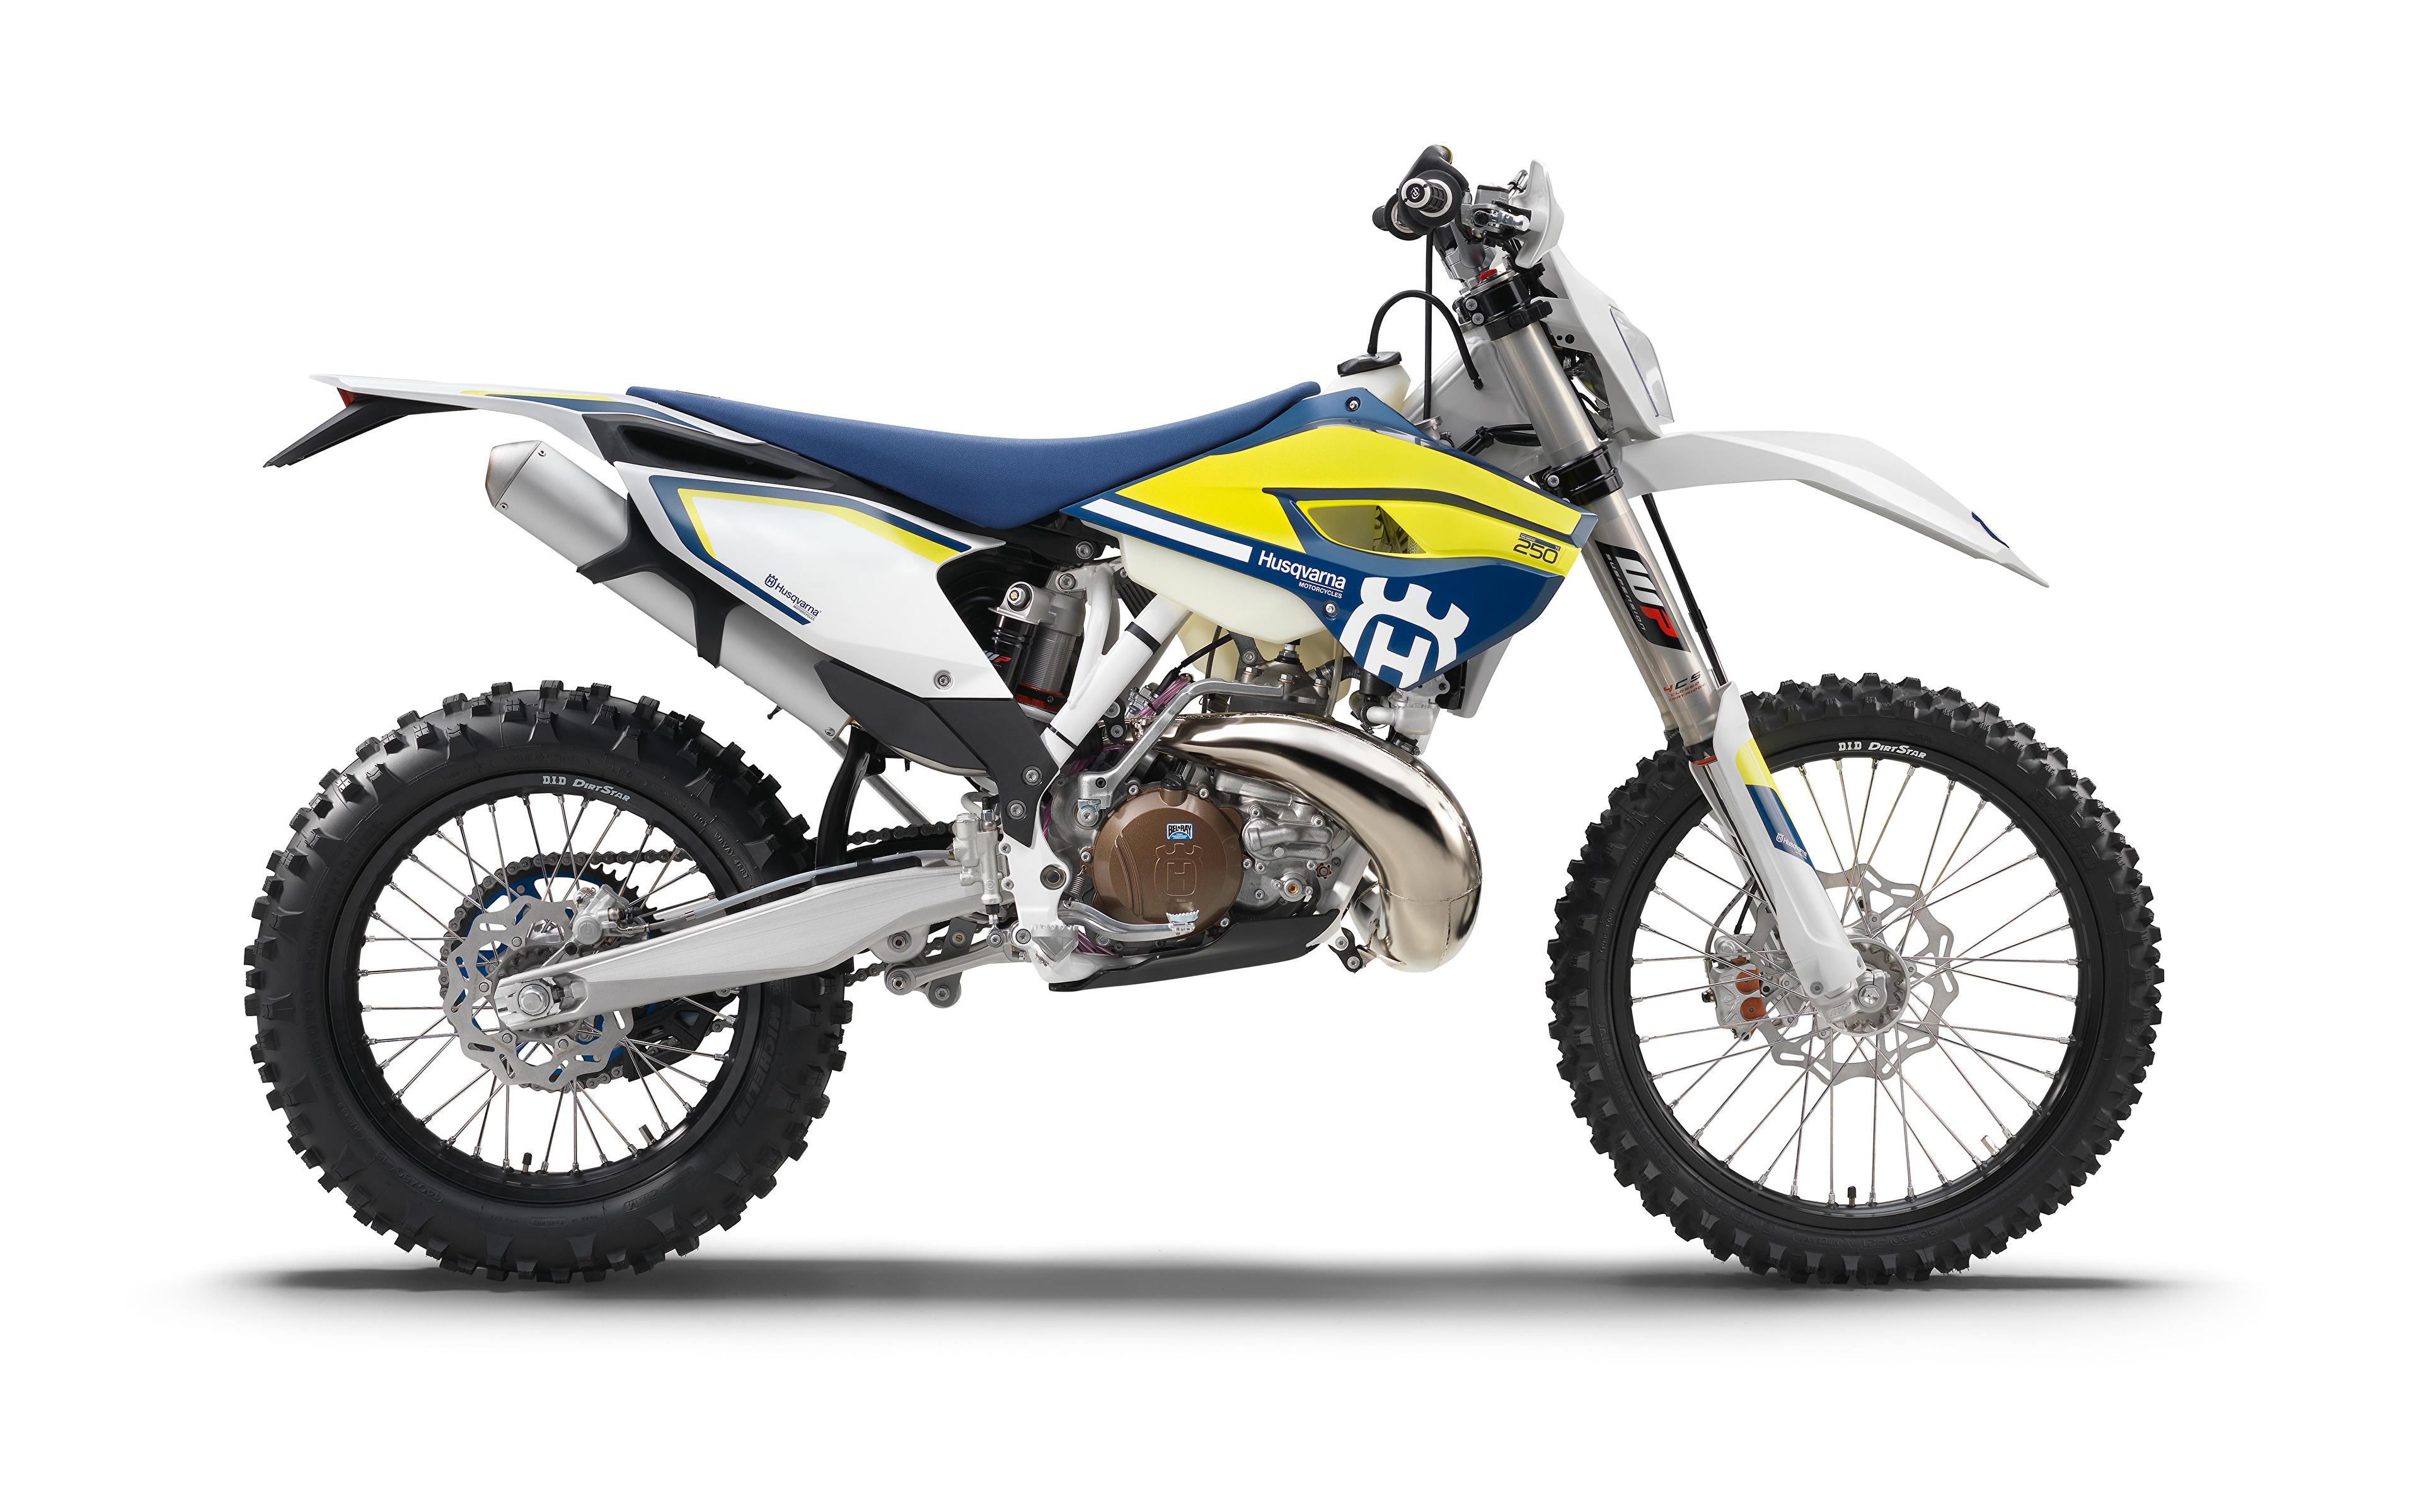 Image 2016-21 Husqvarna TE 250 motorcycle Side White background 3840x2400 Motorcycles